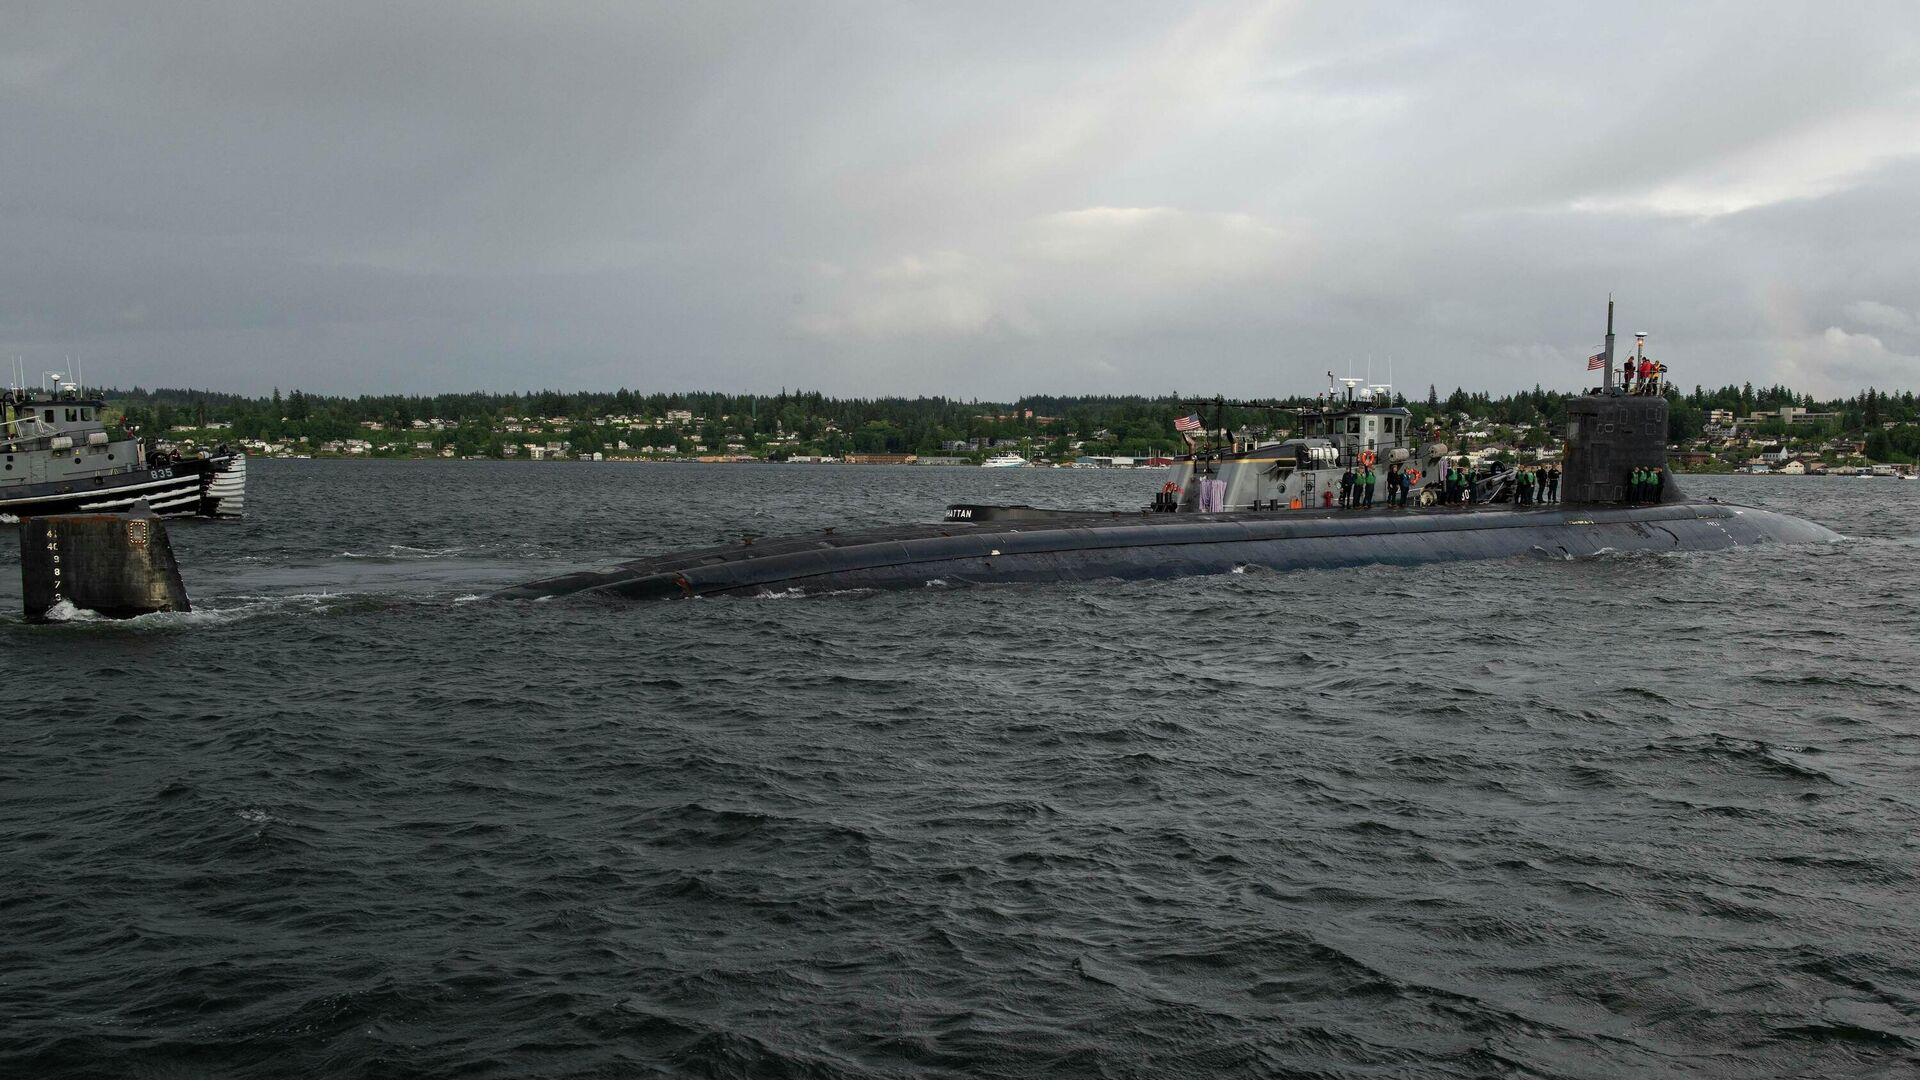 The Seawolf-class fast-attack submarine USS Connecticut (SSN 22) departs Naval Base Kitsap-Bremerton for deployment in Bremerton, Washington on May 27, 2021 - Sputnik International, 1920, 08.10.2021